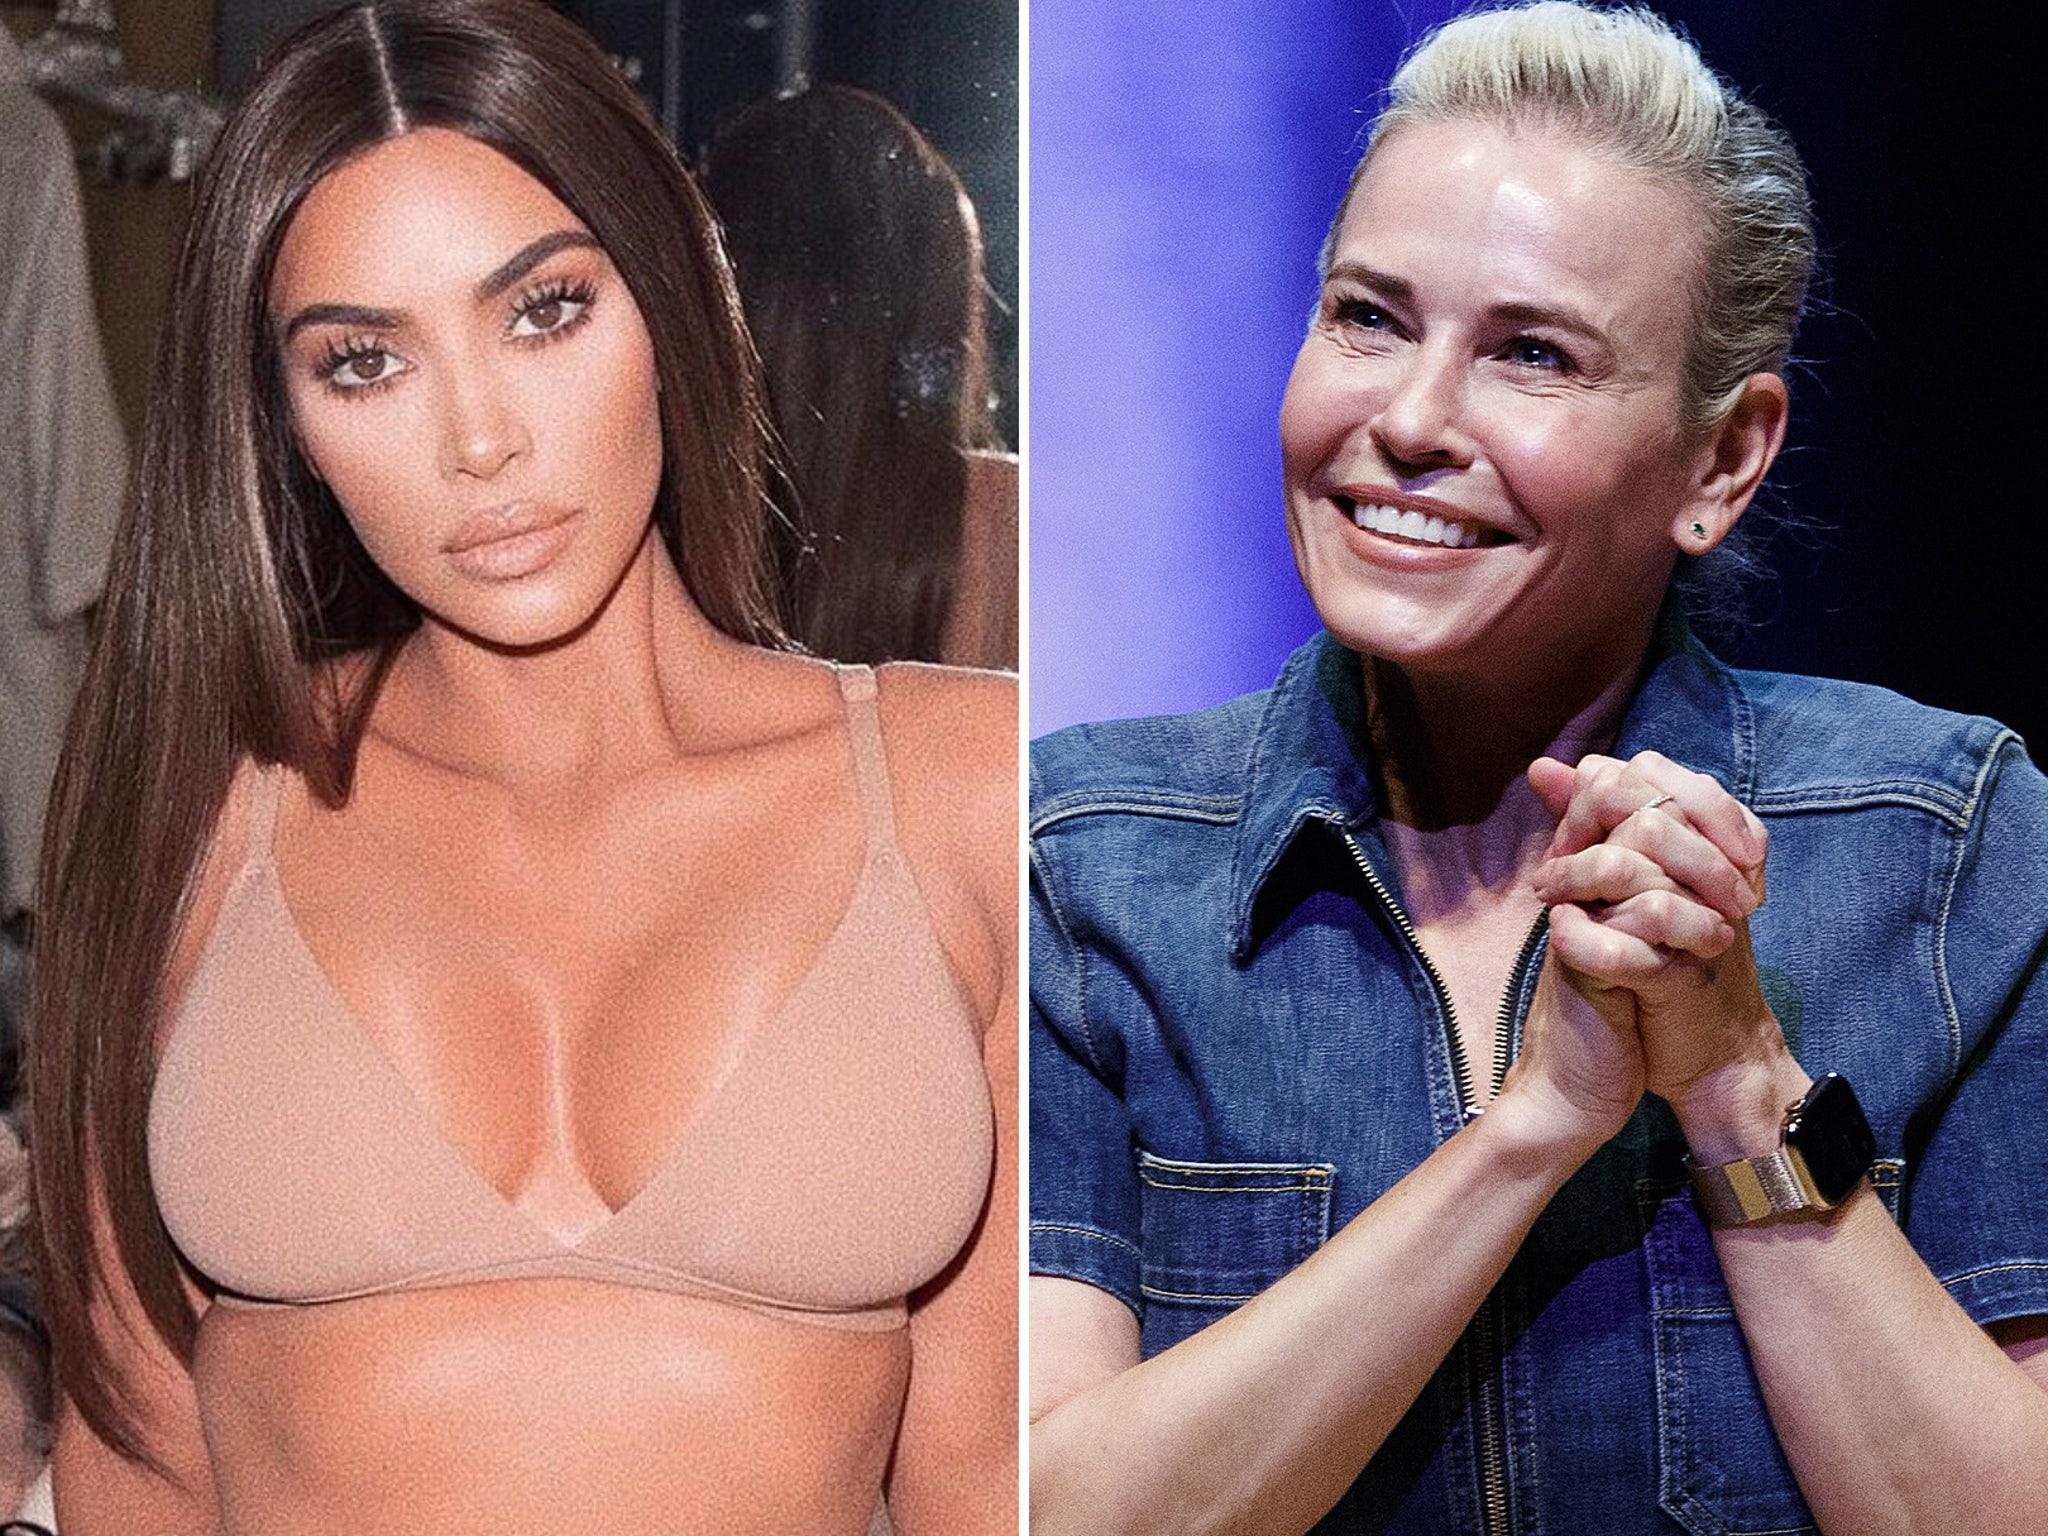 Kim Kardashian Showing Pussy photo 19